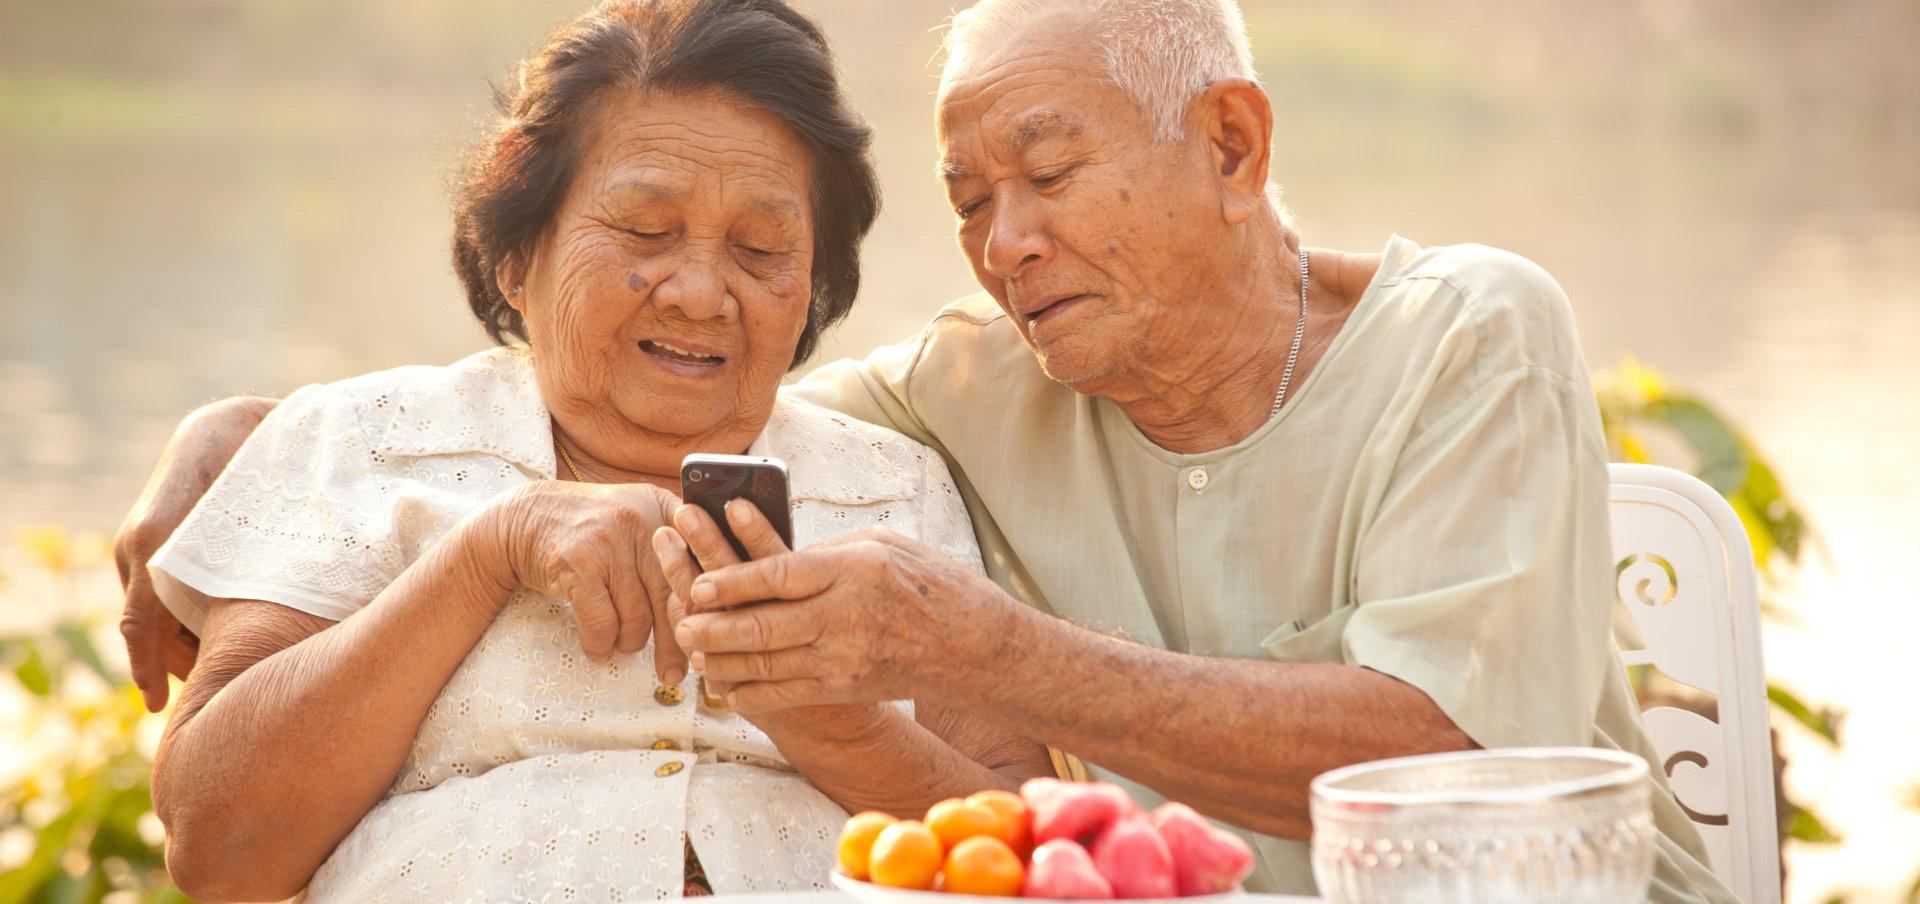 elder couple using mobile phone